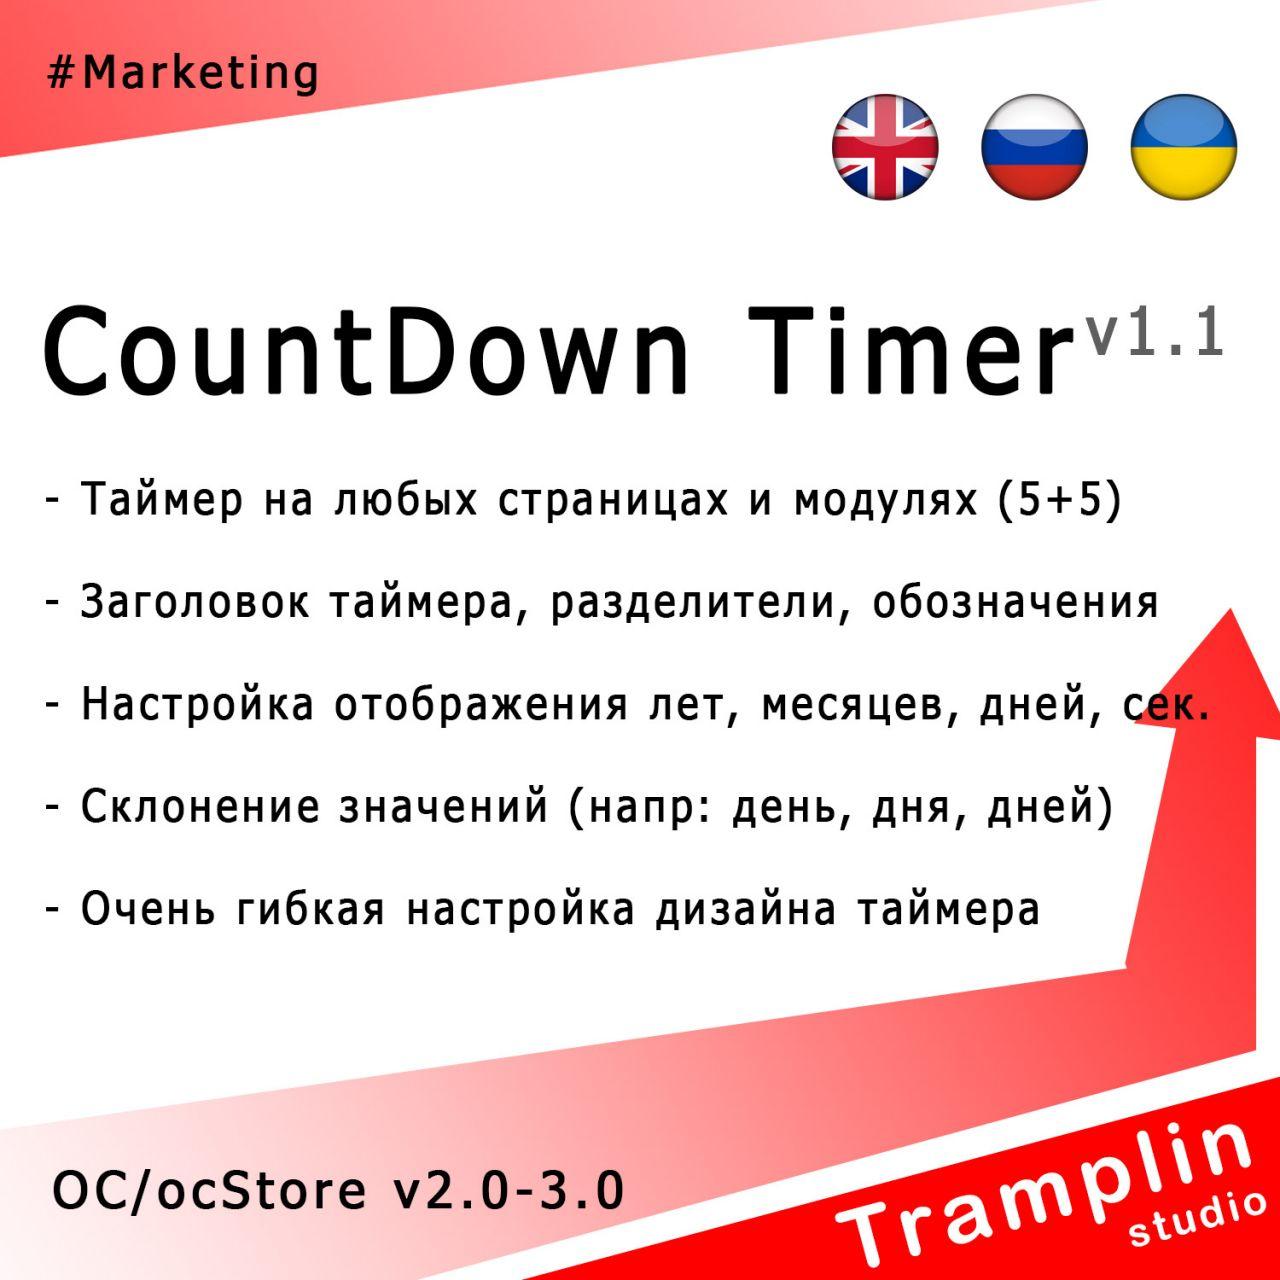 TS CountDown Timer из категории Цены, скидки, акции, подарки для CMS OpenCart (ОпенКарт)